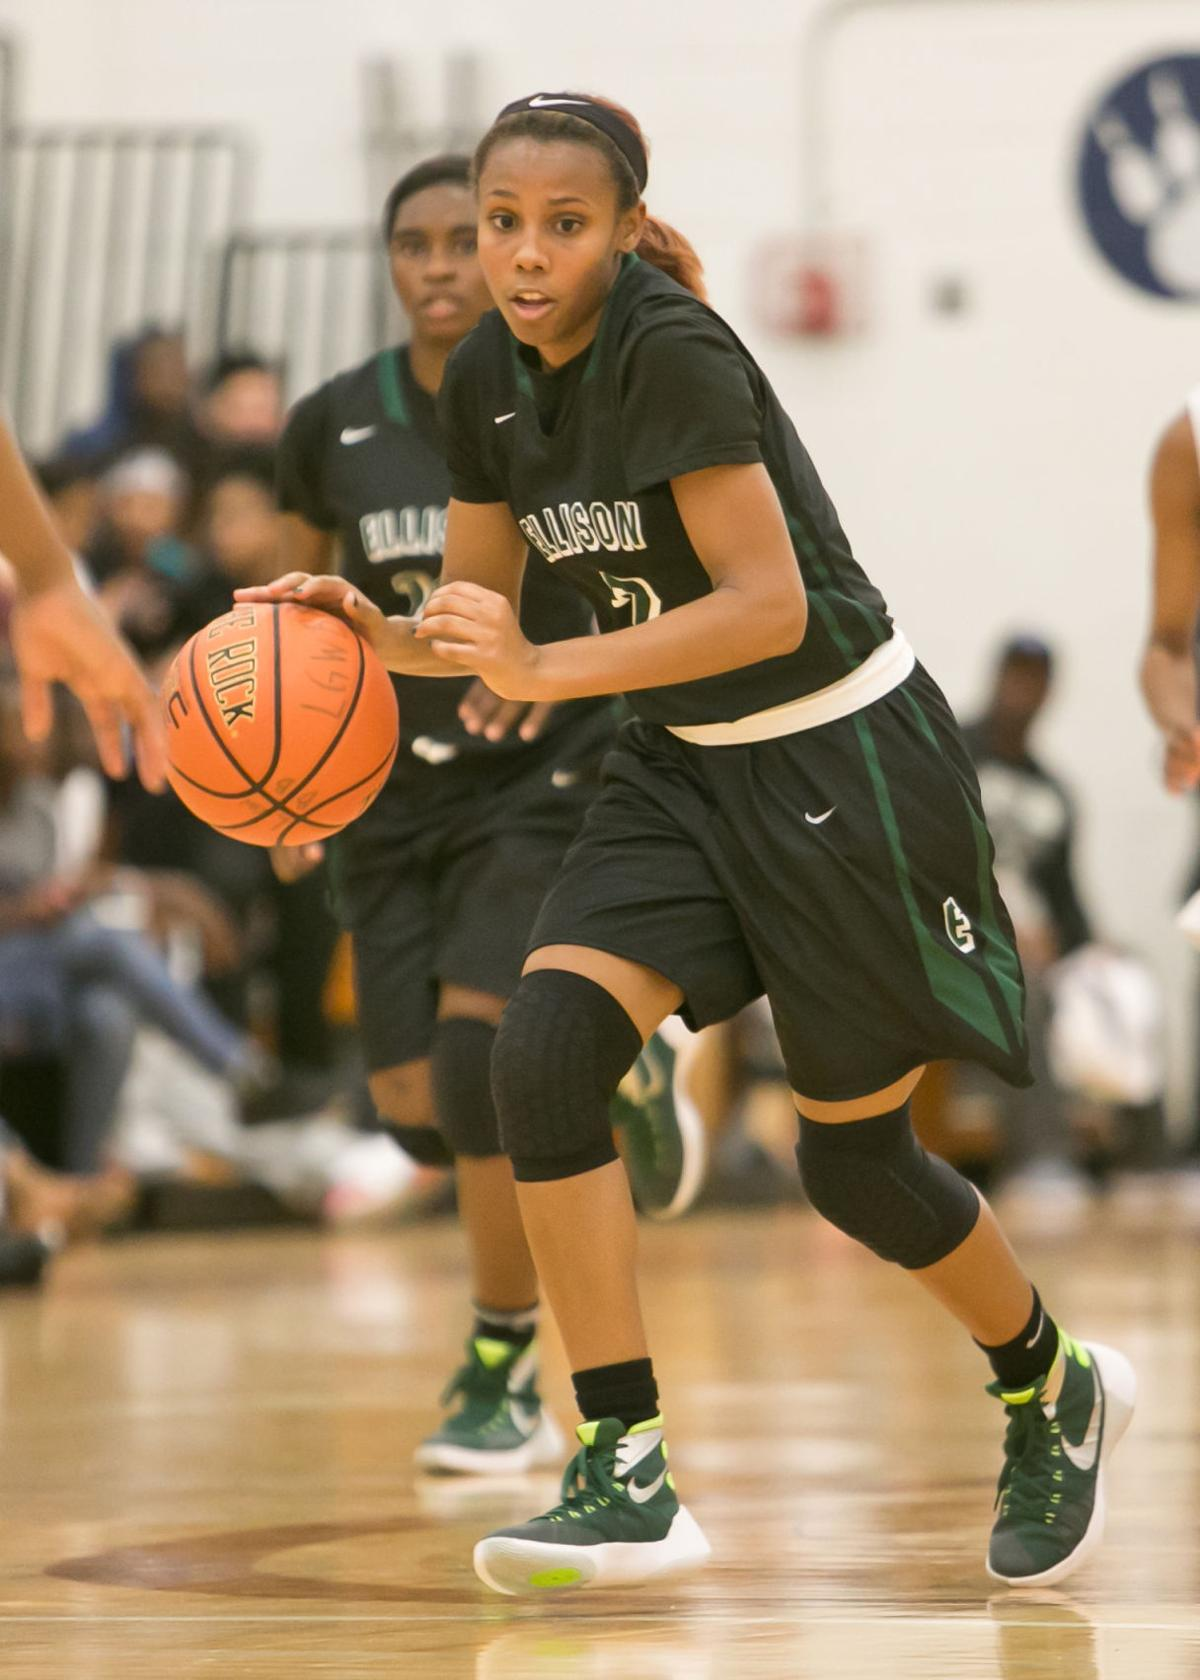 Ellison at Shoemaker Girls Basketball